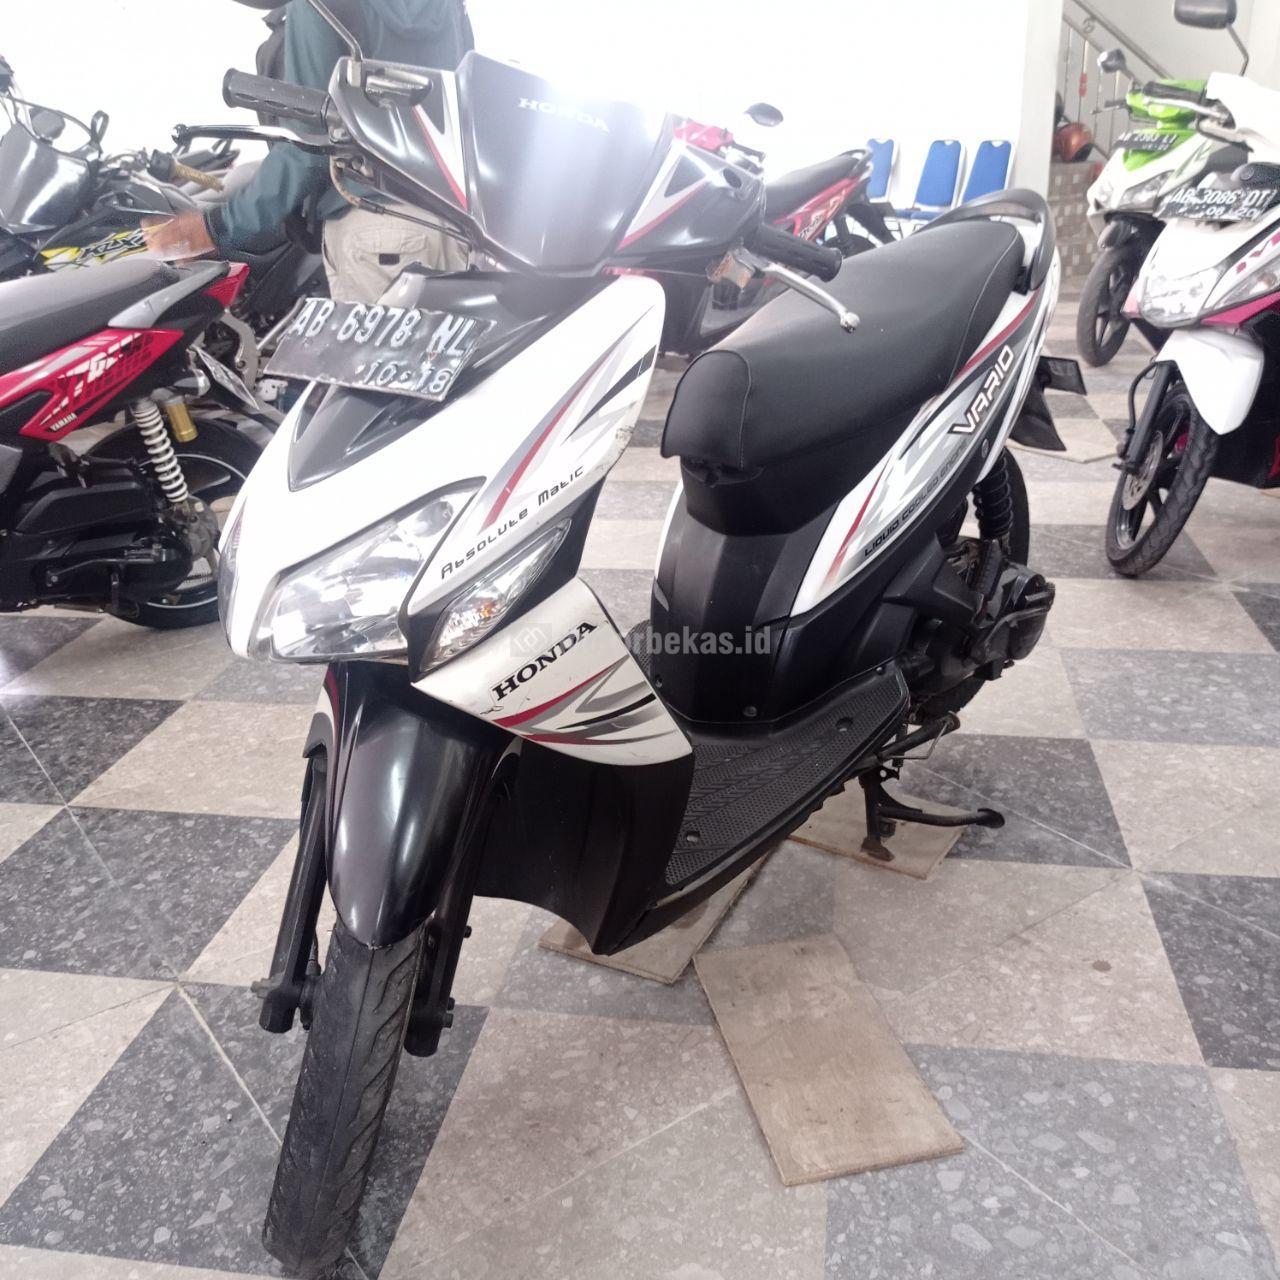 HONDA VARIO 110  2013 motorbekas.id